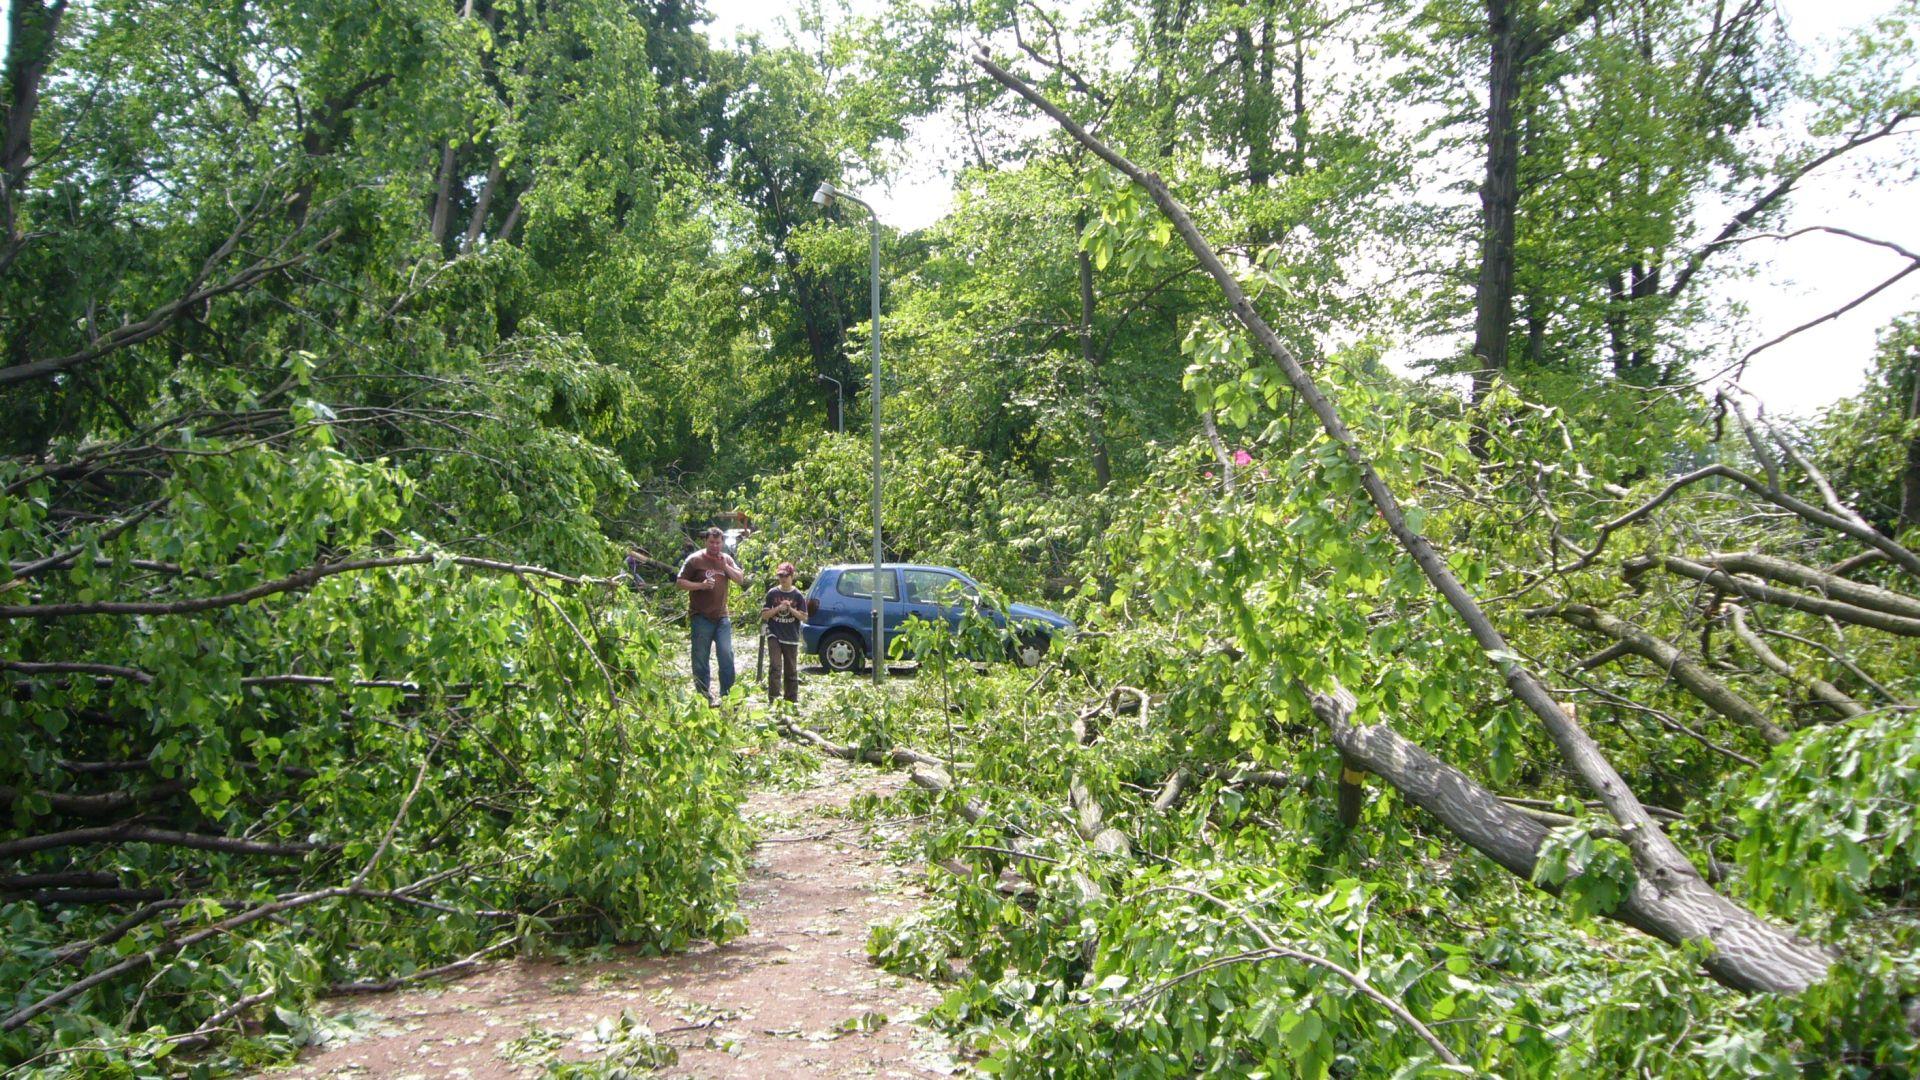 http://www.abload.de/img/tornadogrossenhain015kbt3.jpg